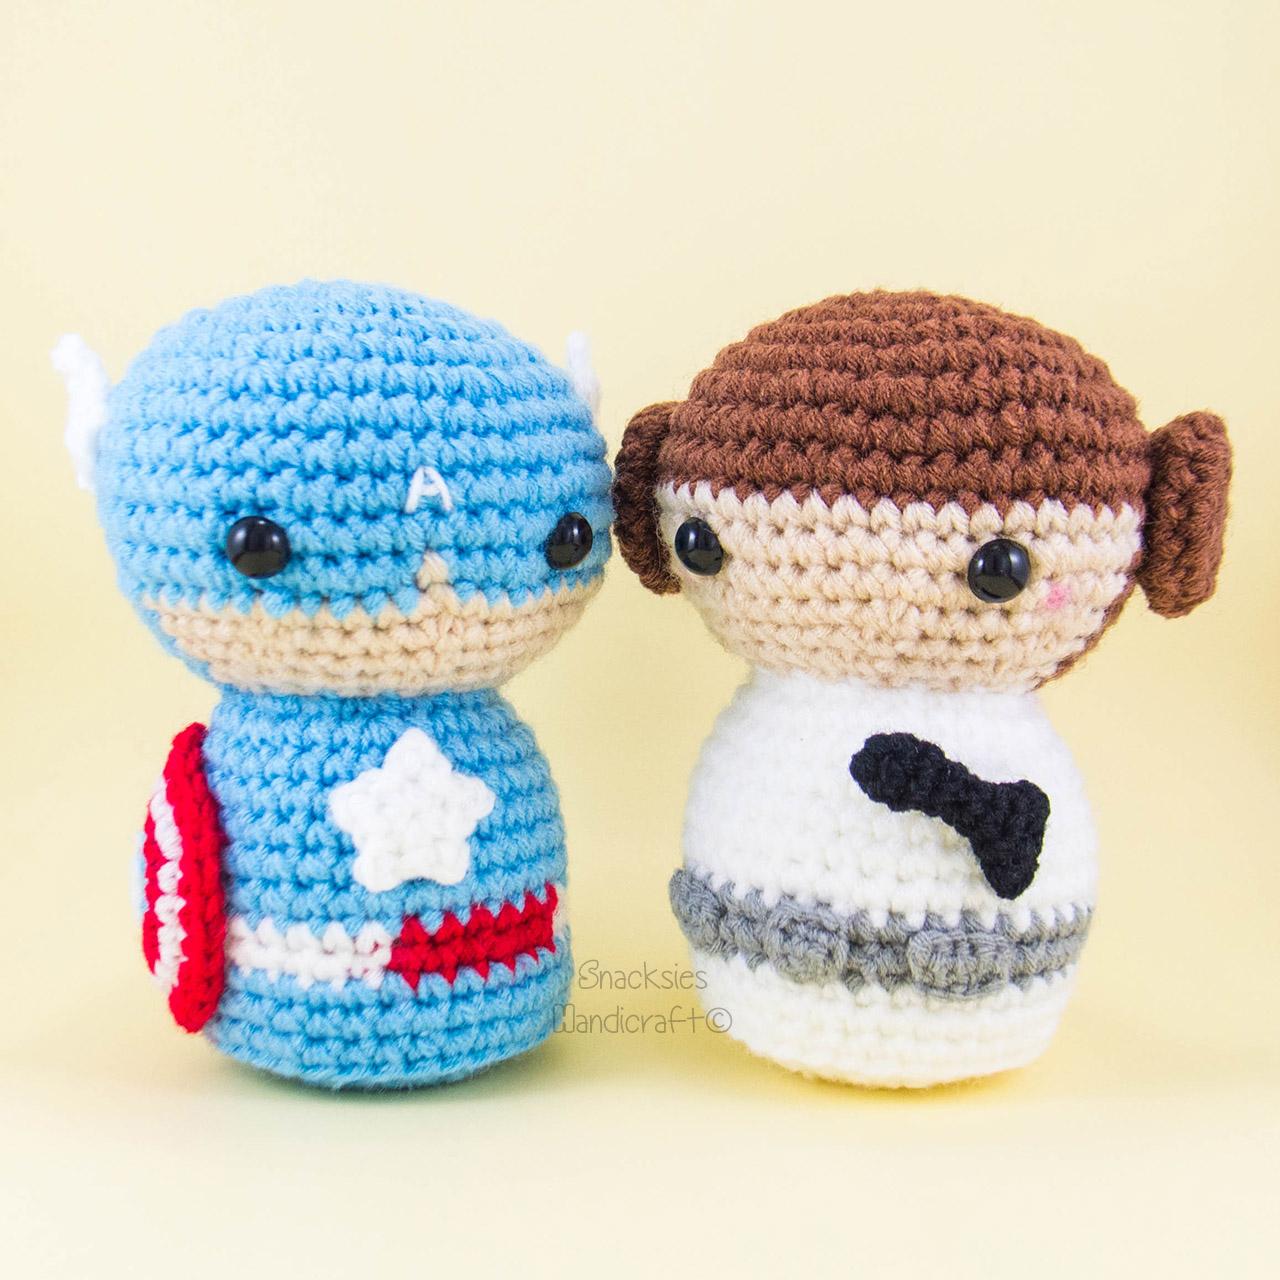 Captain America And Princess Leia Snacksies Handicraft Corner